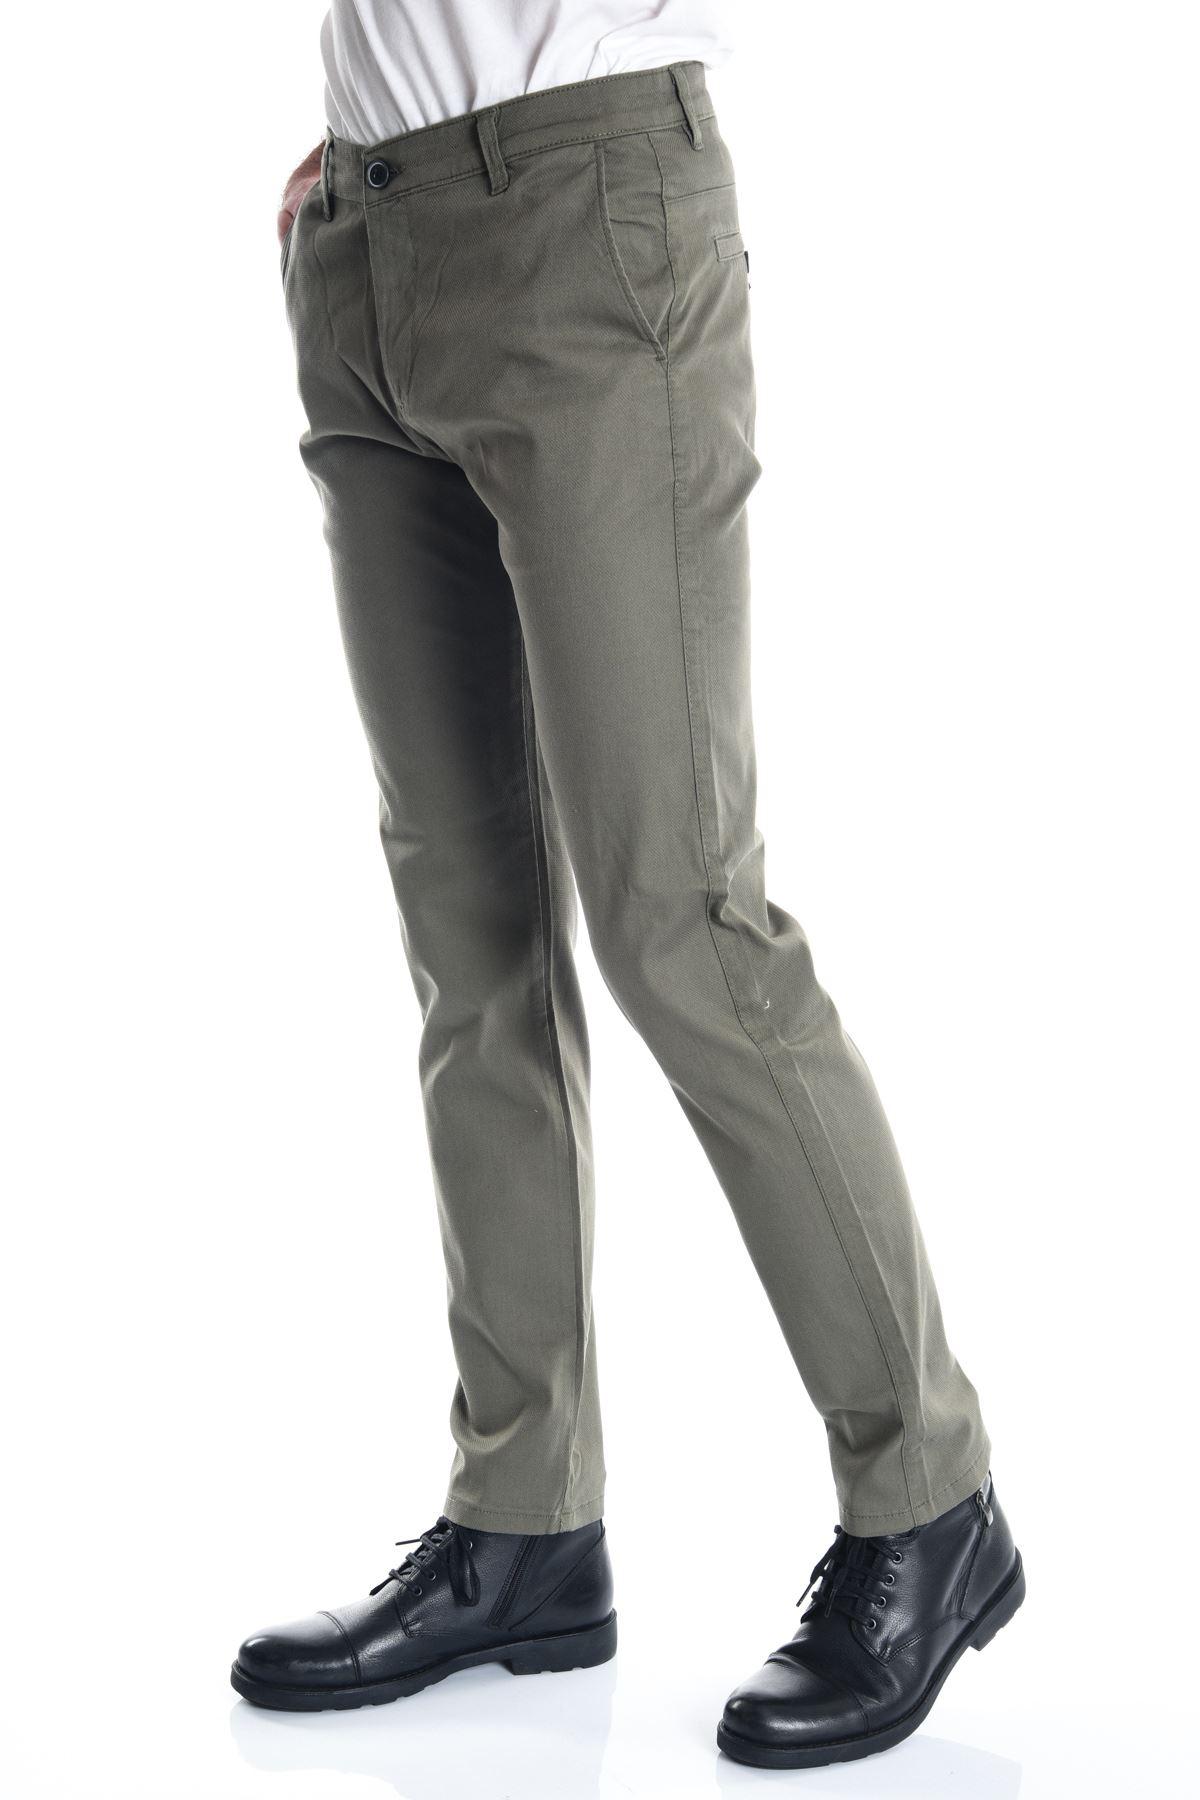 Haki Slimfit Chino Erkek Pantolon